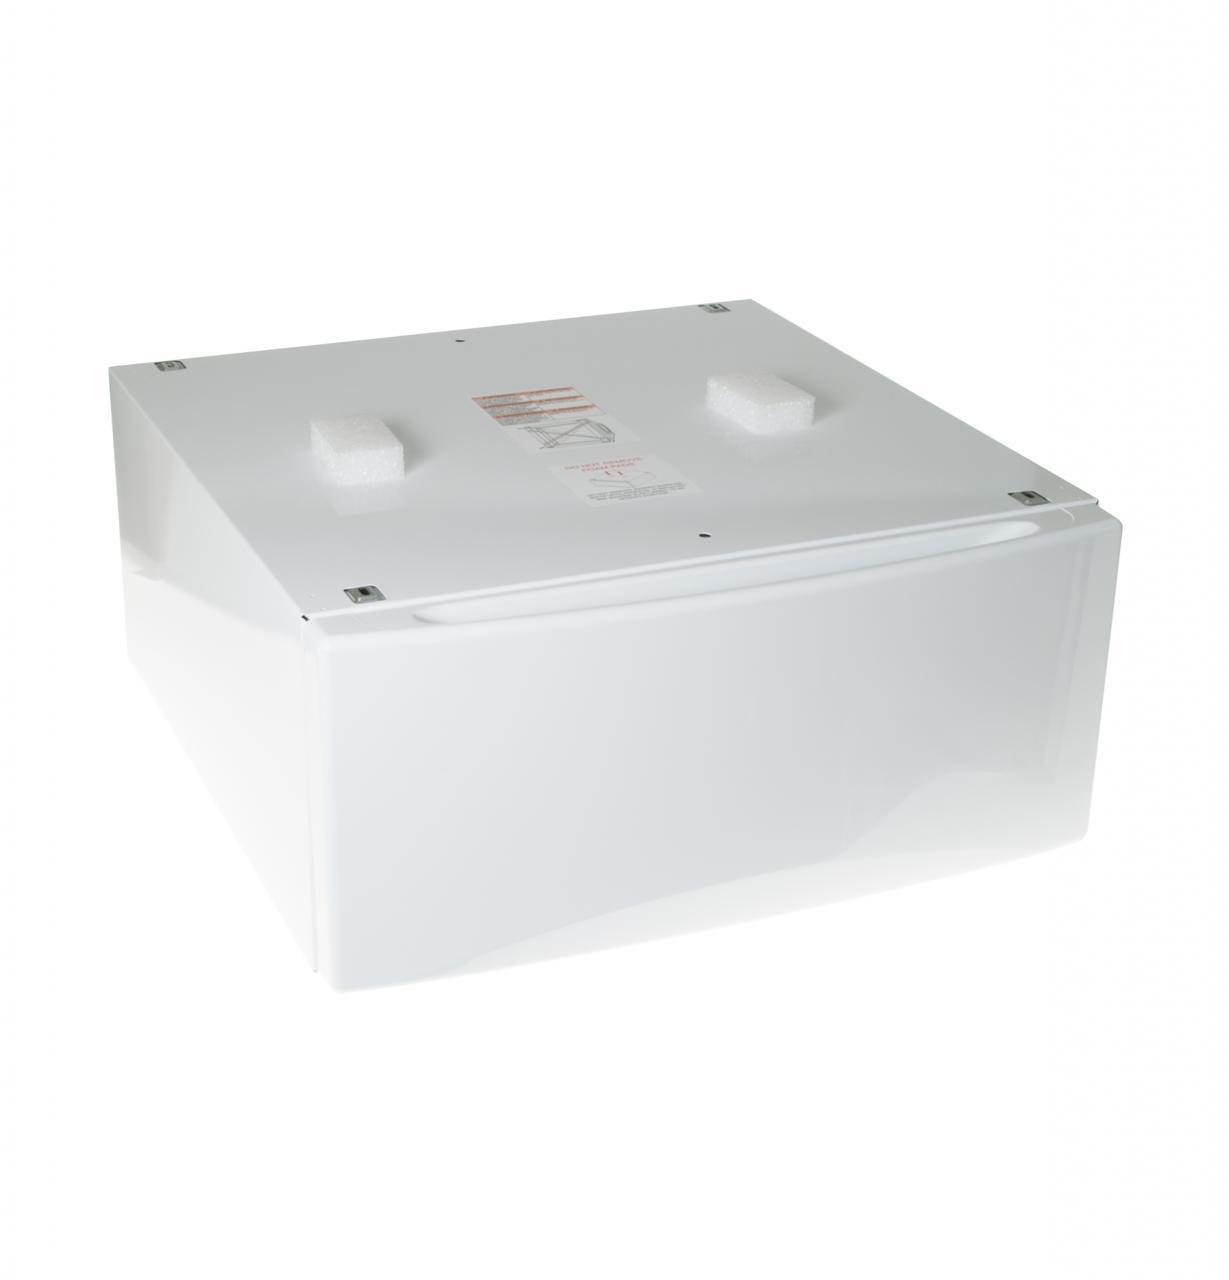 glide laundry appliances pedestal electrolux luxury titanium home extras